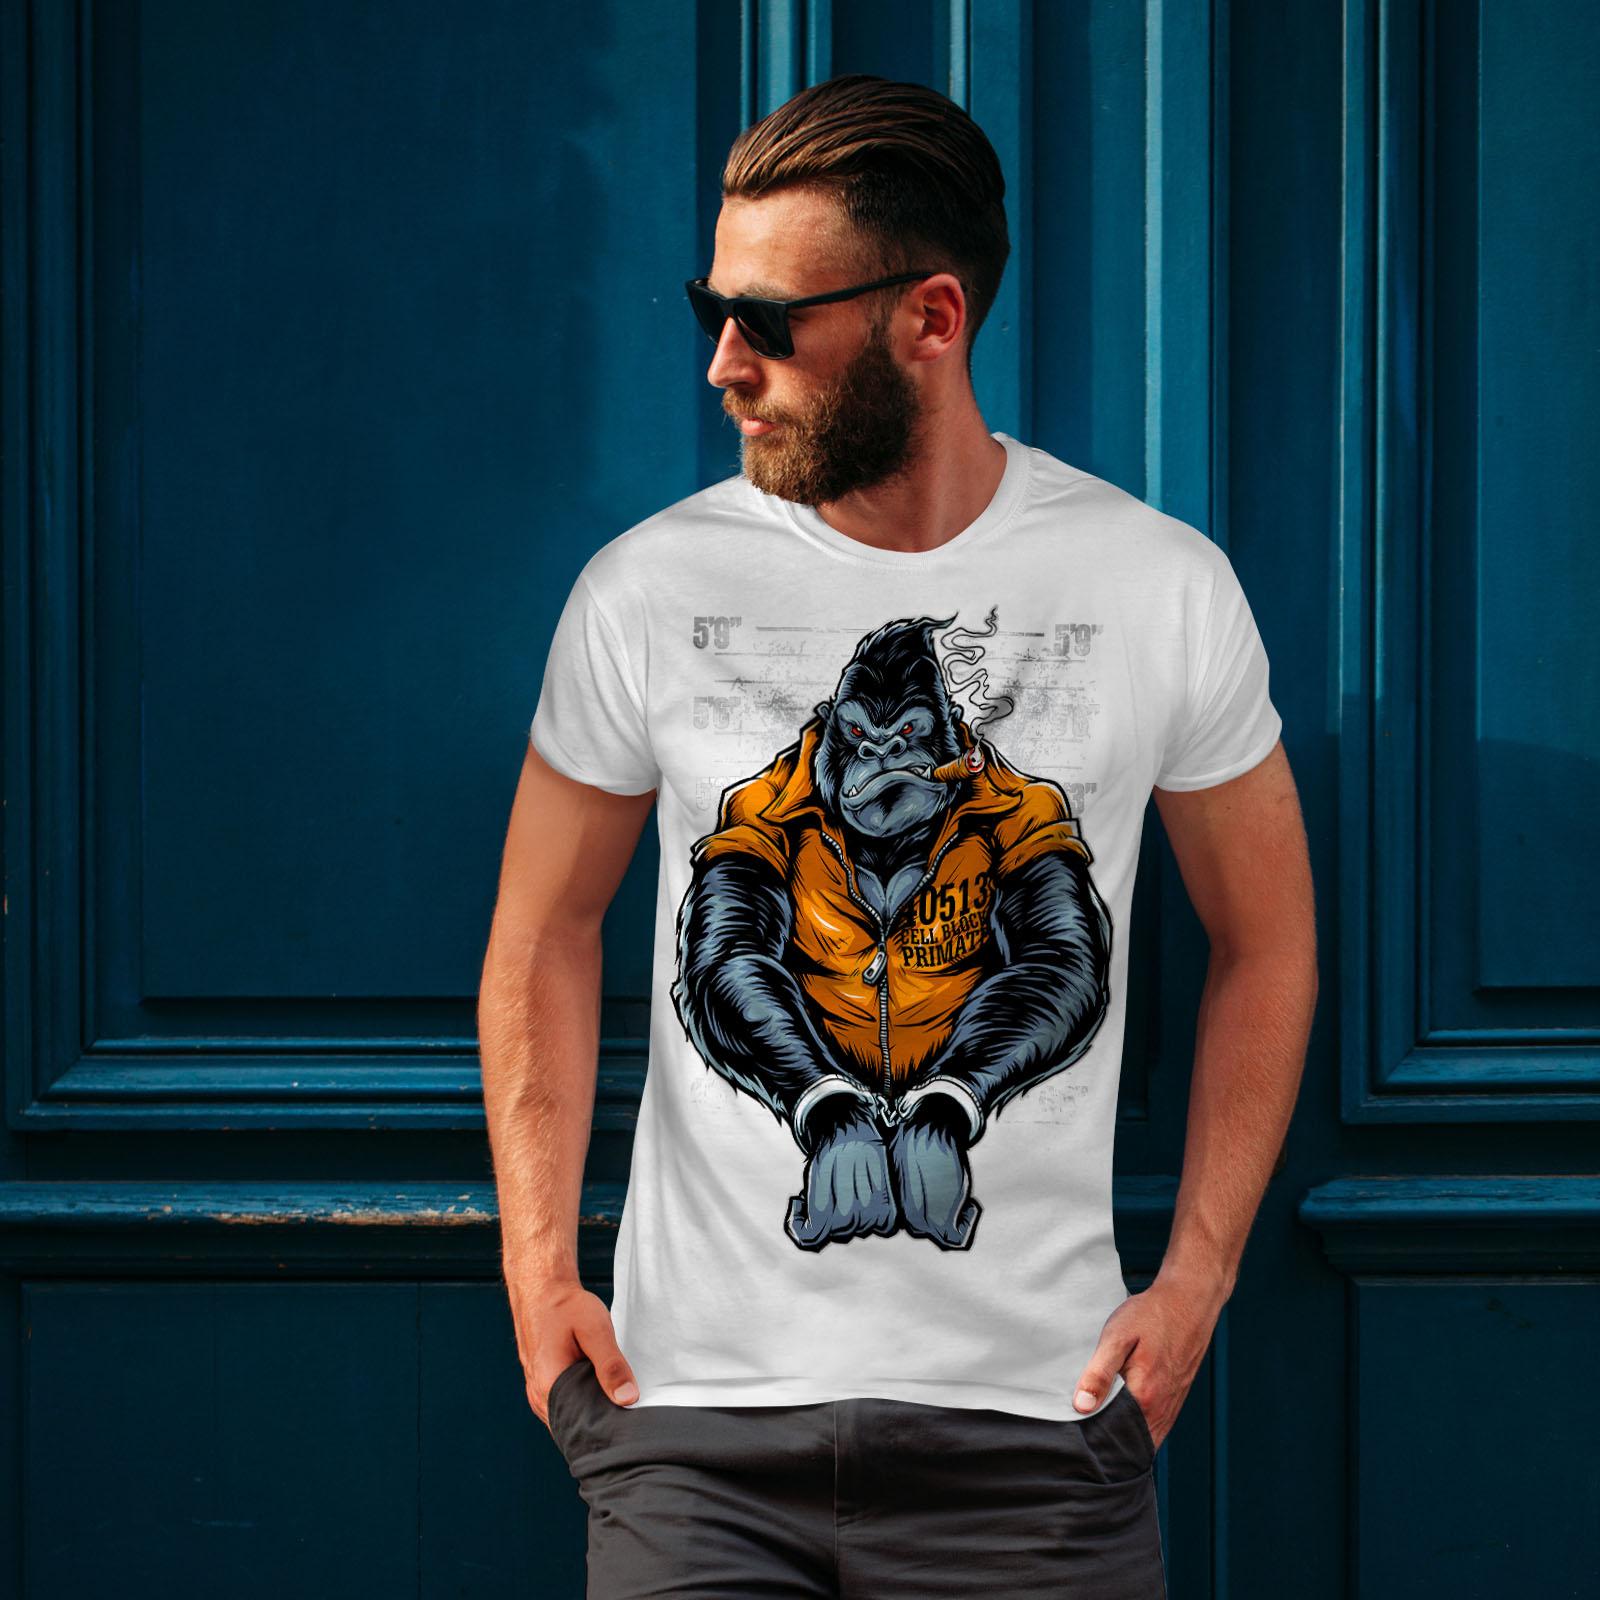 Wellcoda-Monkey-Ape-Prison-Mens-T-shirt-Wild-Graphic-Design-Printed-Tee thumbnail 10